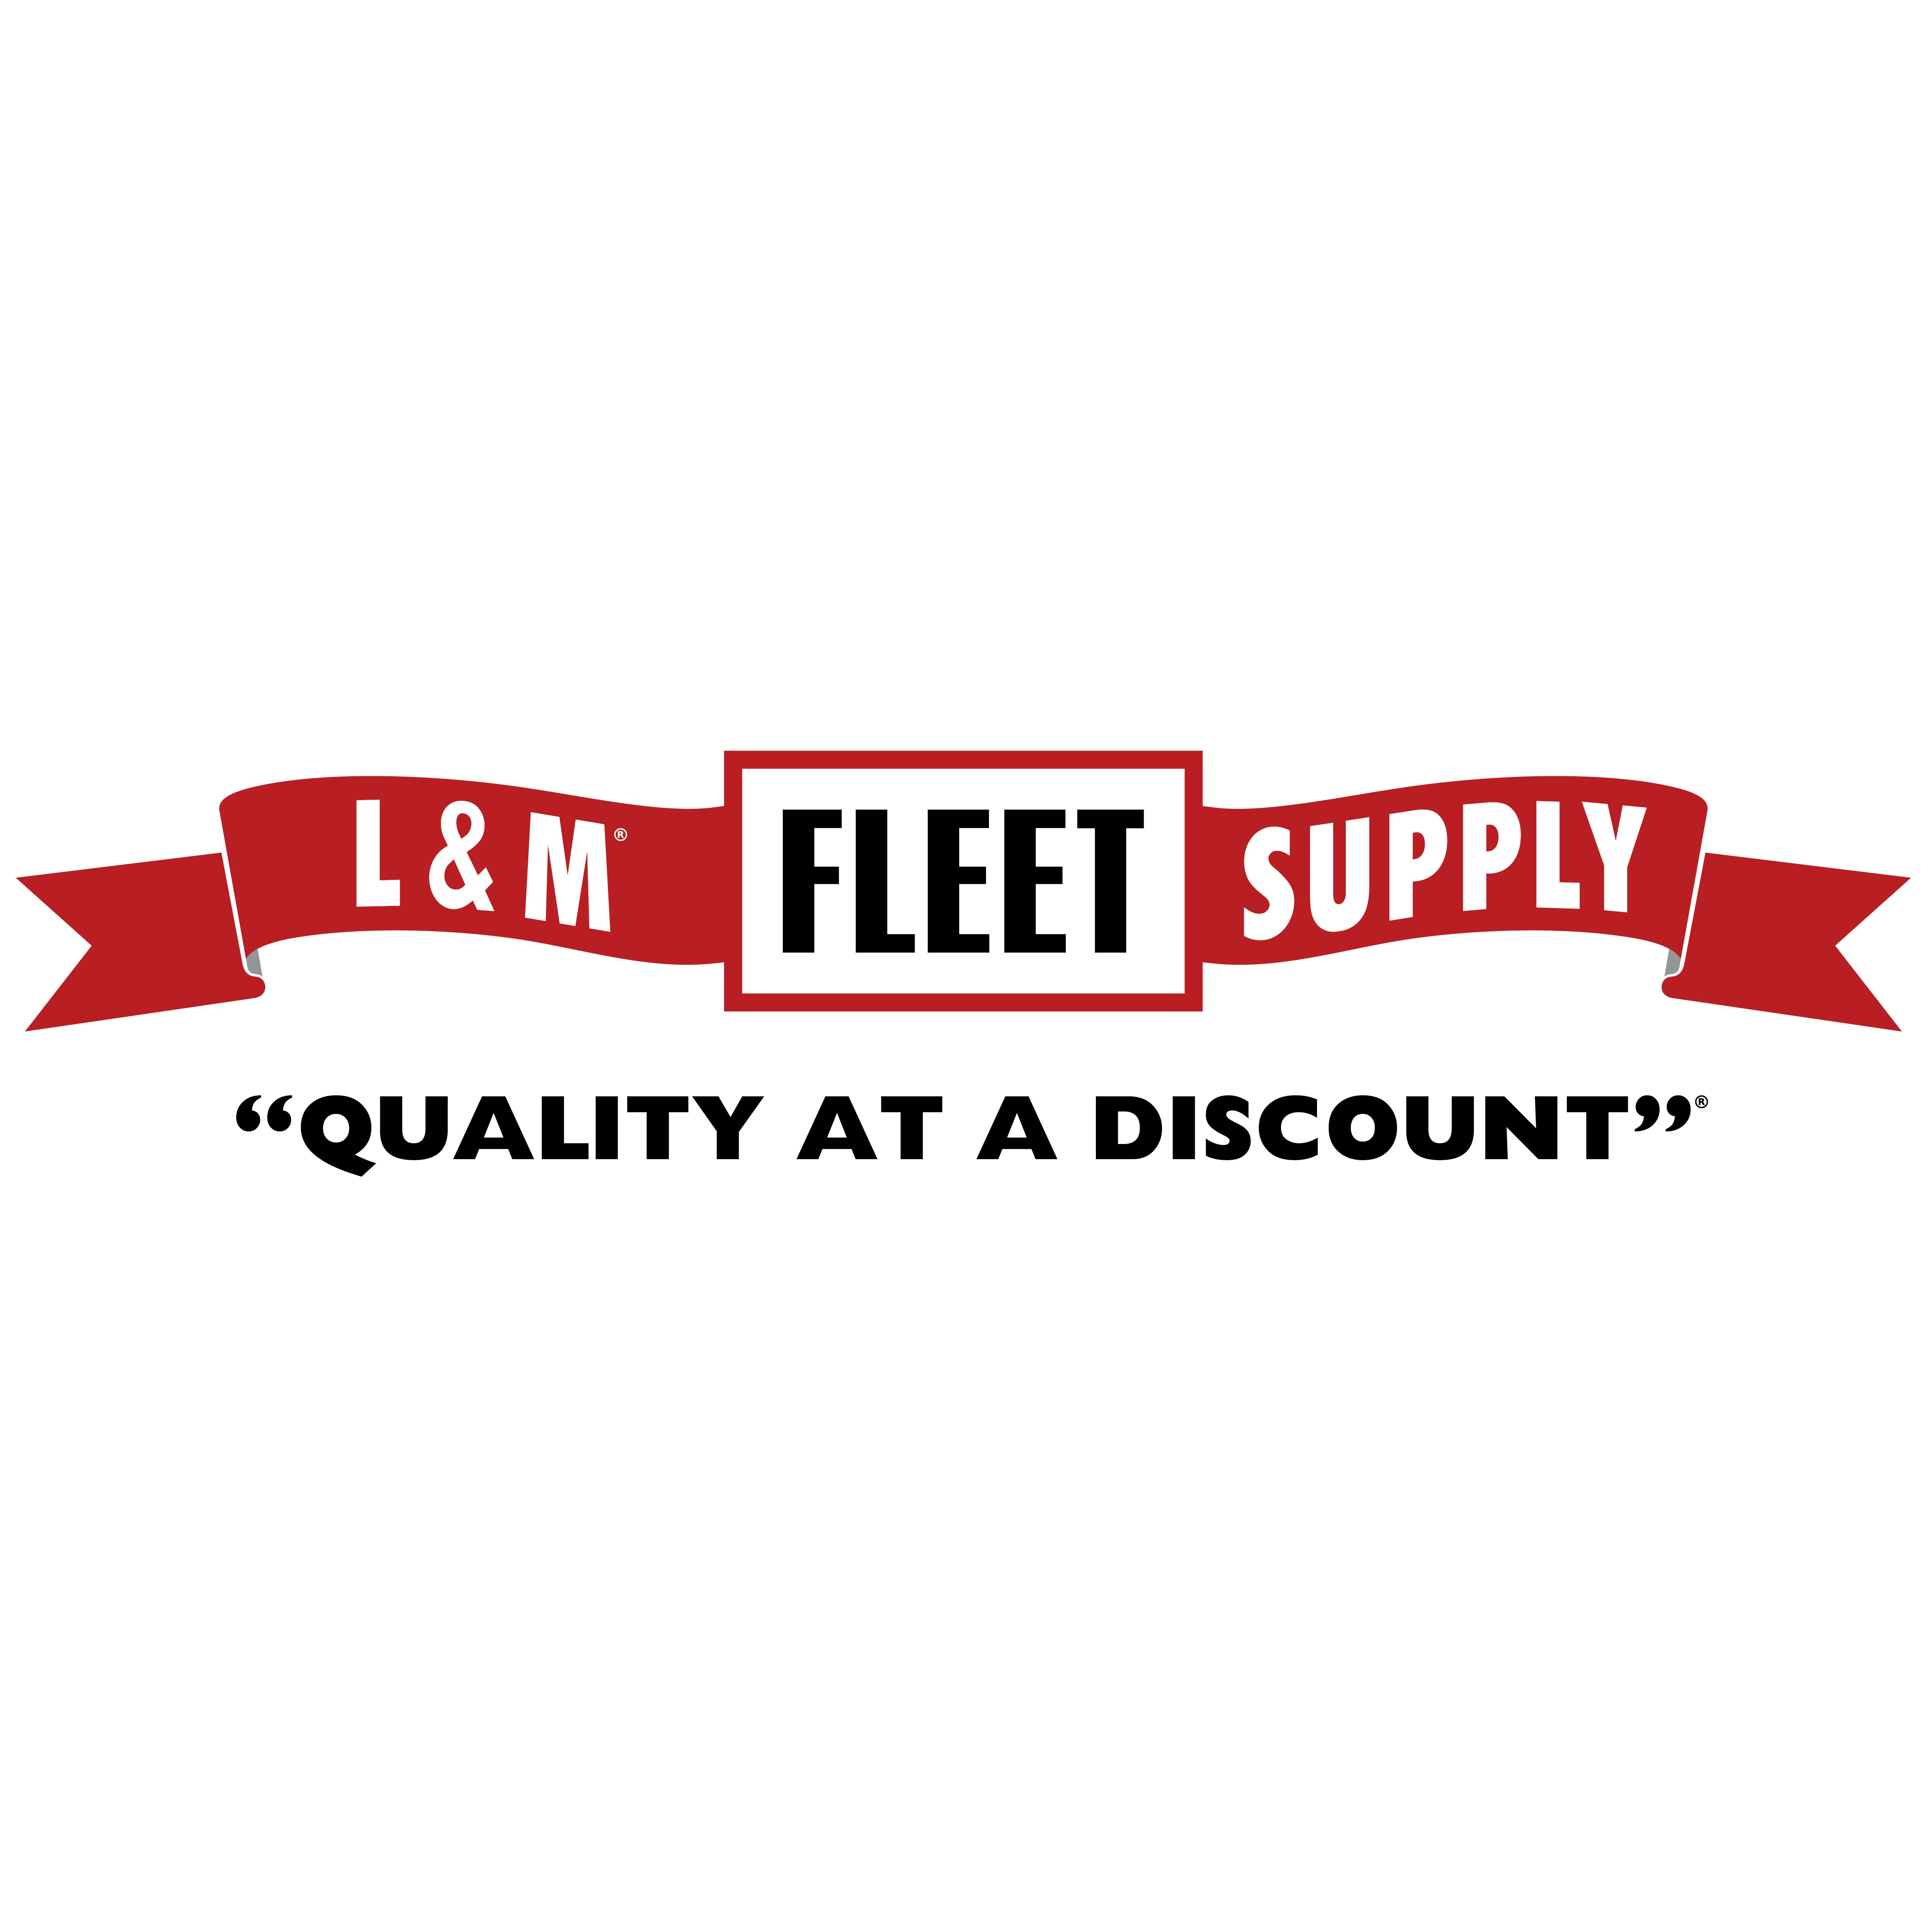 L&M Fleet Supply